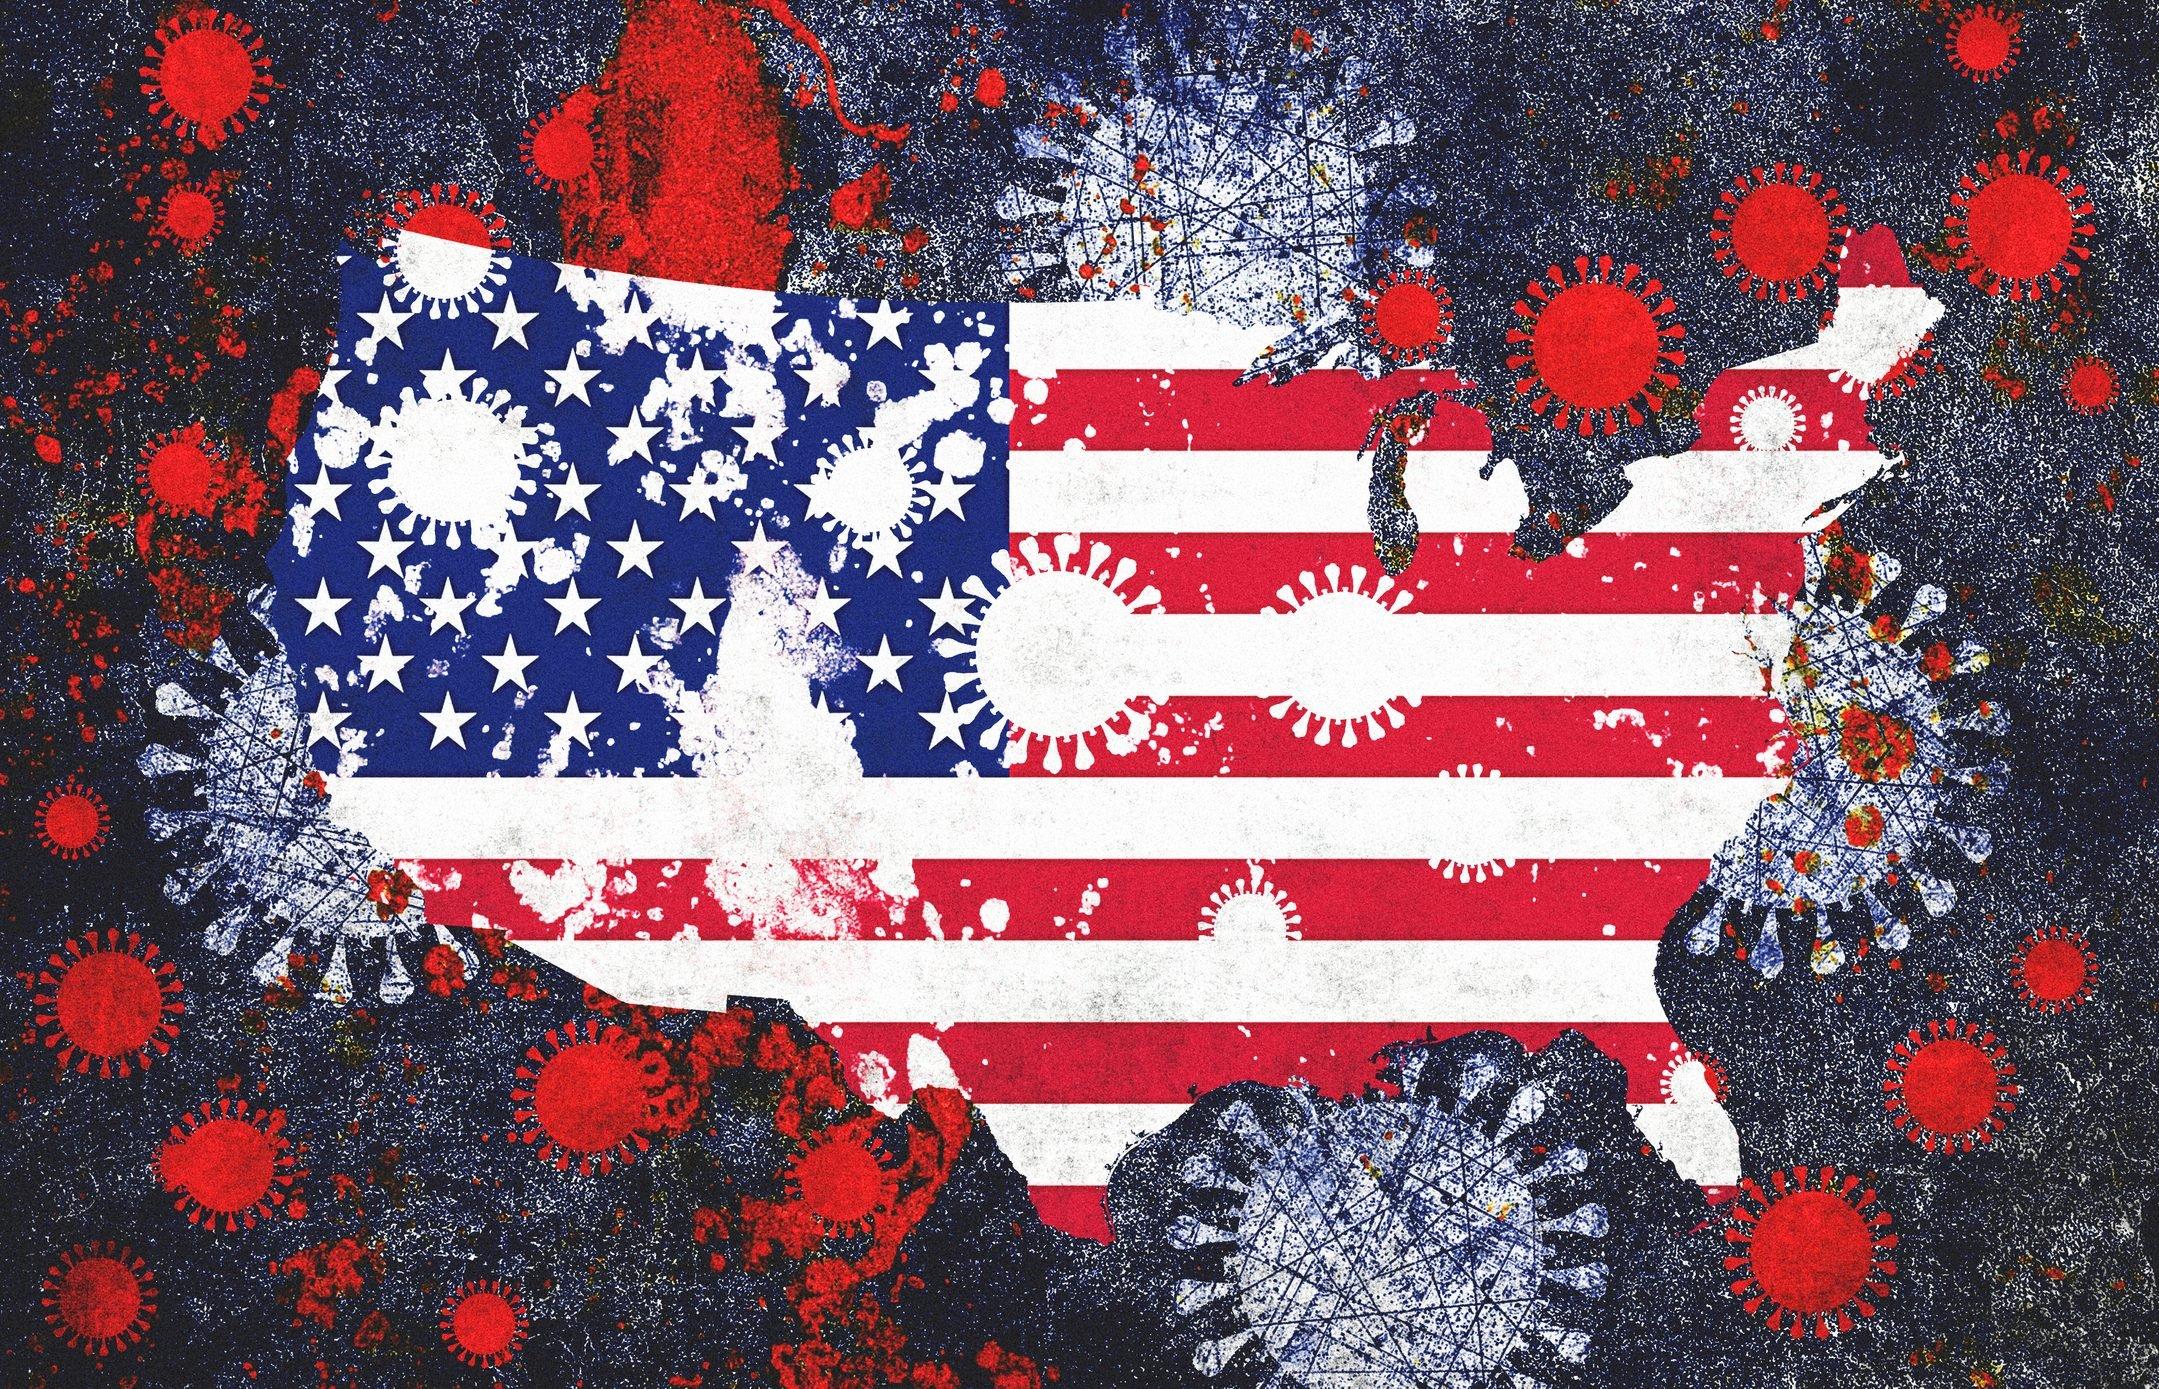 Coronavirus COVID-19 and USA Map and Flag